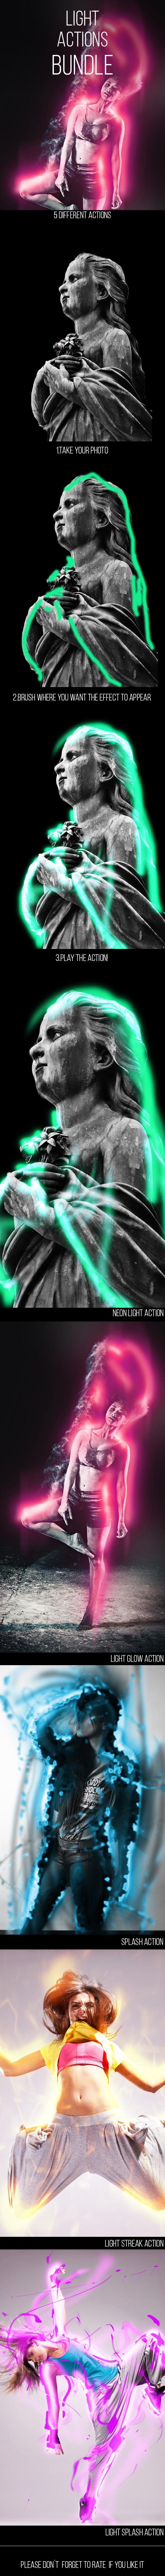 Light Photoshop Actions Bundle - Photo Effects Actions